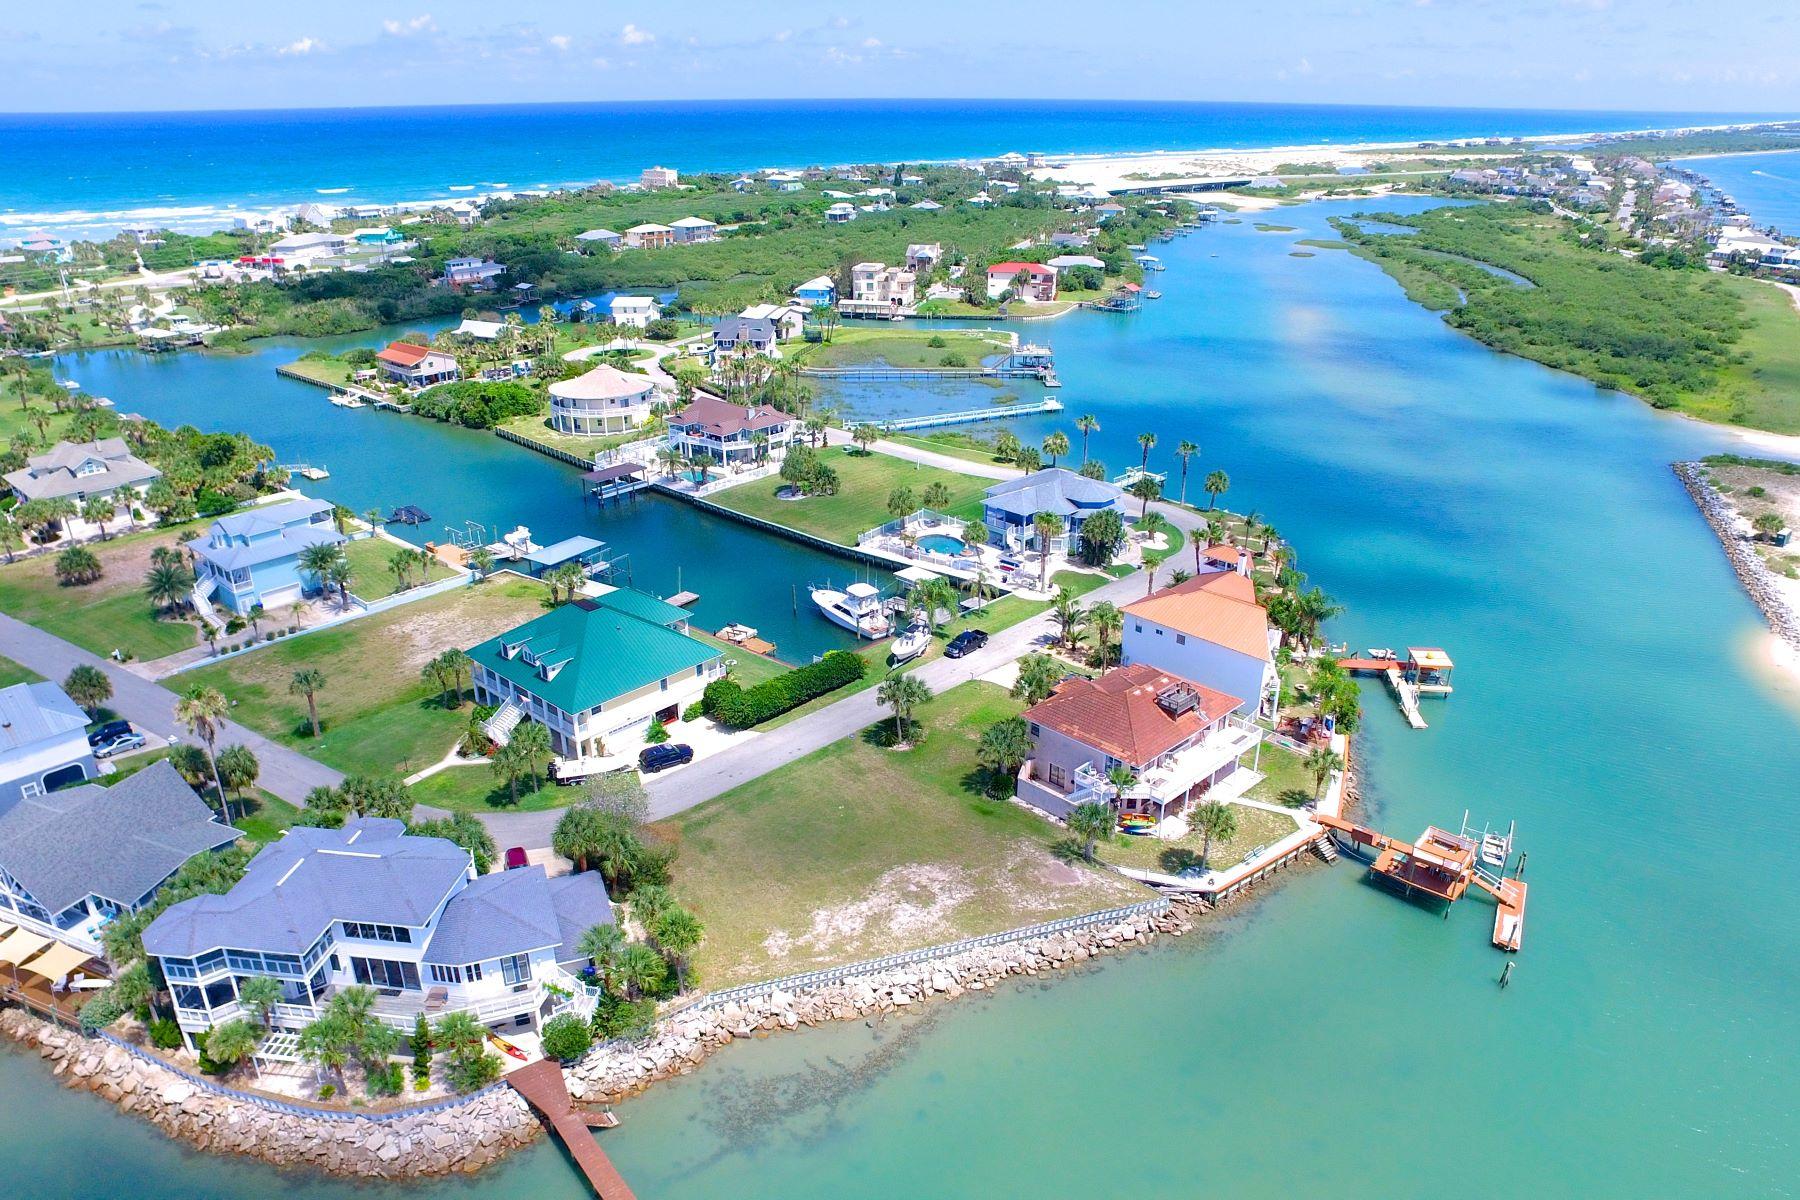 Đất đai vì Bán tại 121' Waterfront Island Lot 256 Barrataria Drive St. Augustine, Florida, 32080 Hoa Kỳ